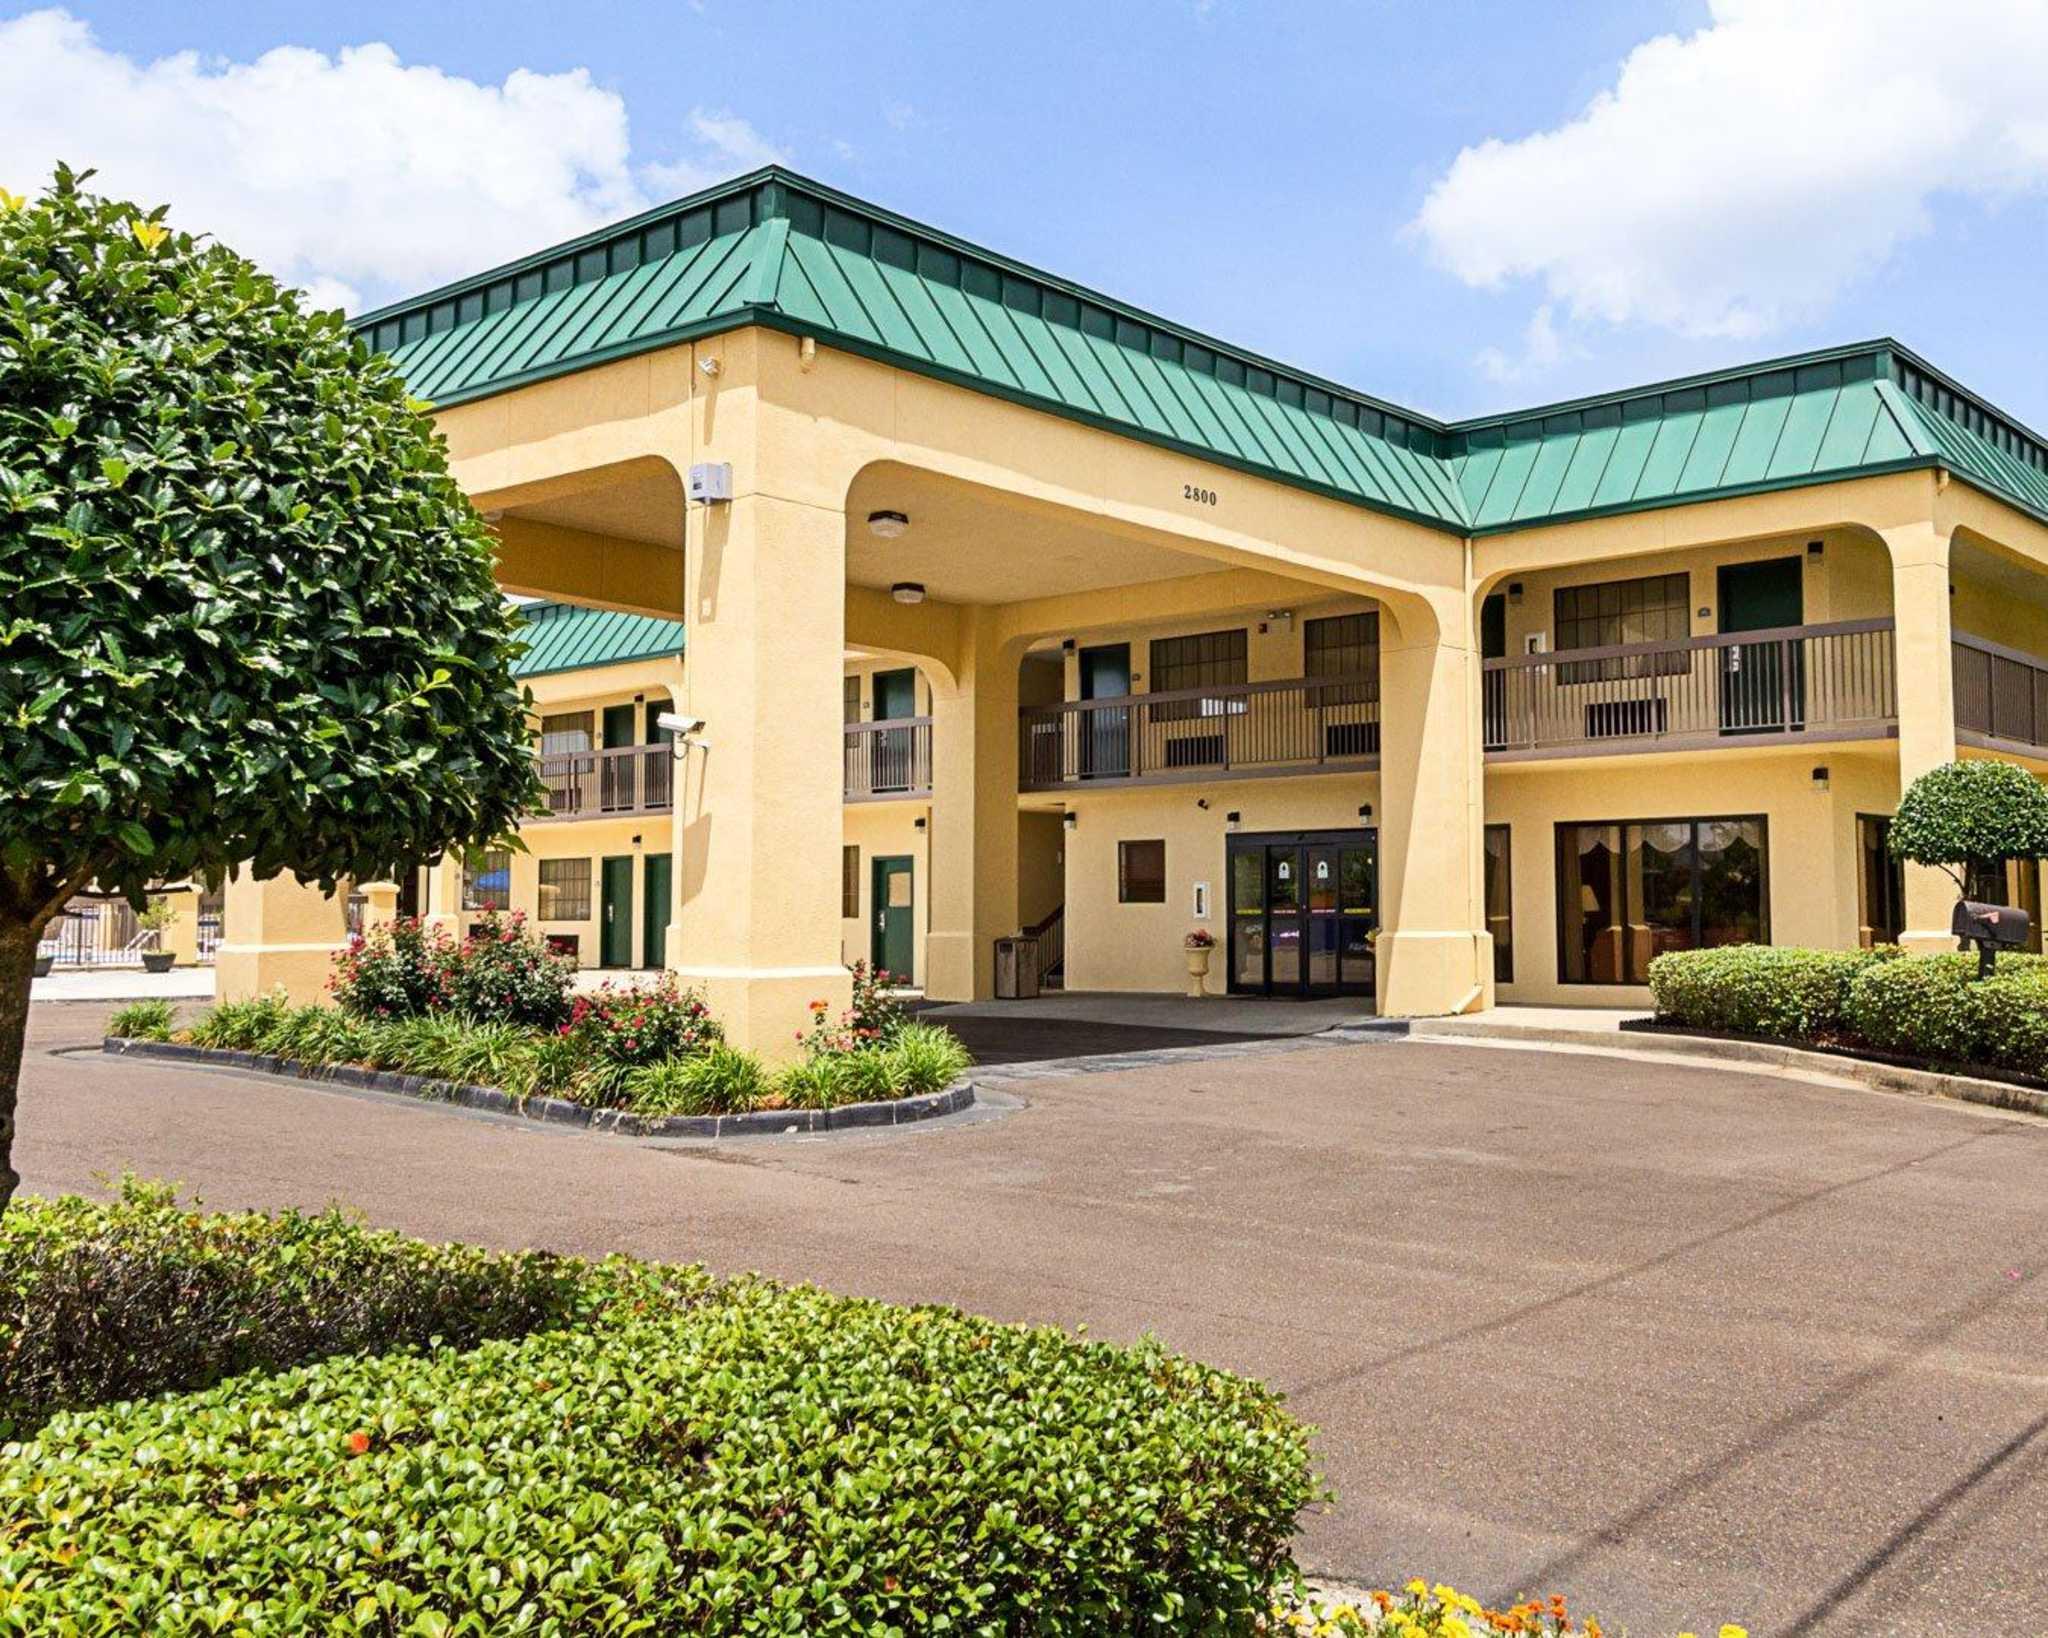 Quality Inn & Suites Southwest image 1